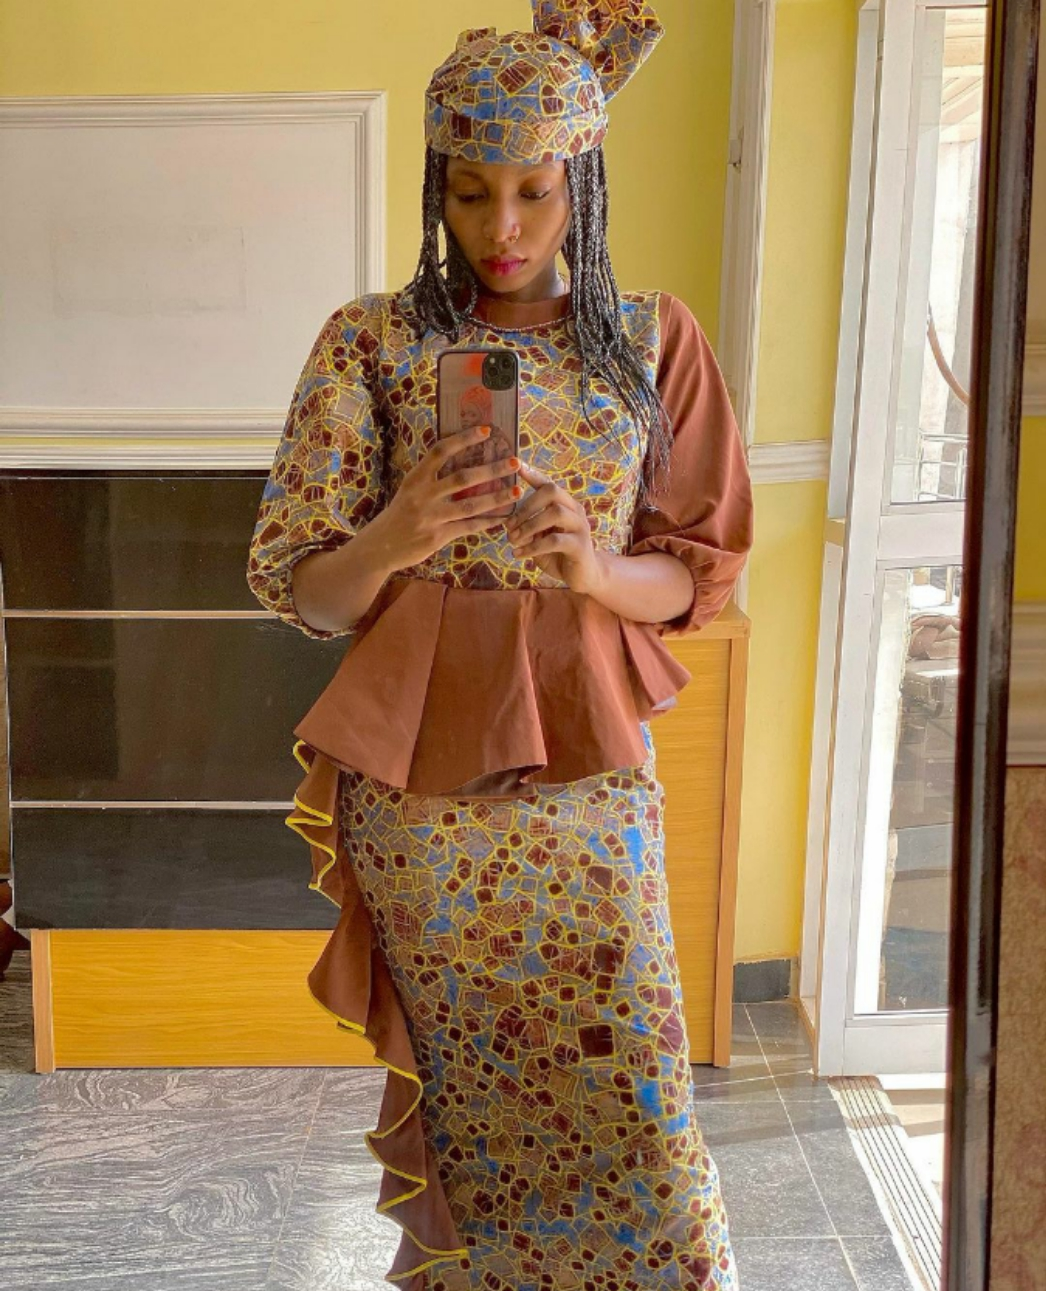 Fashion Killer: Checkout Recent Pictures of Maryam Waziri